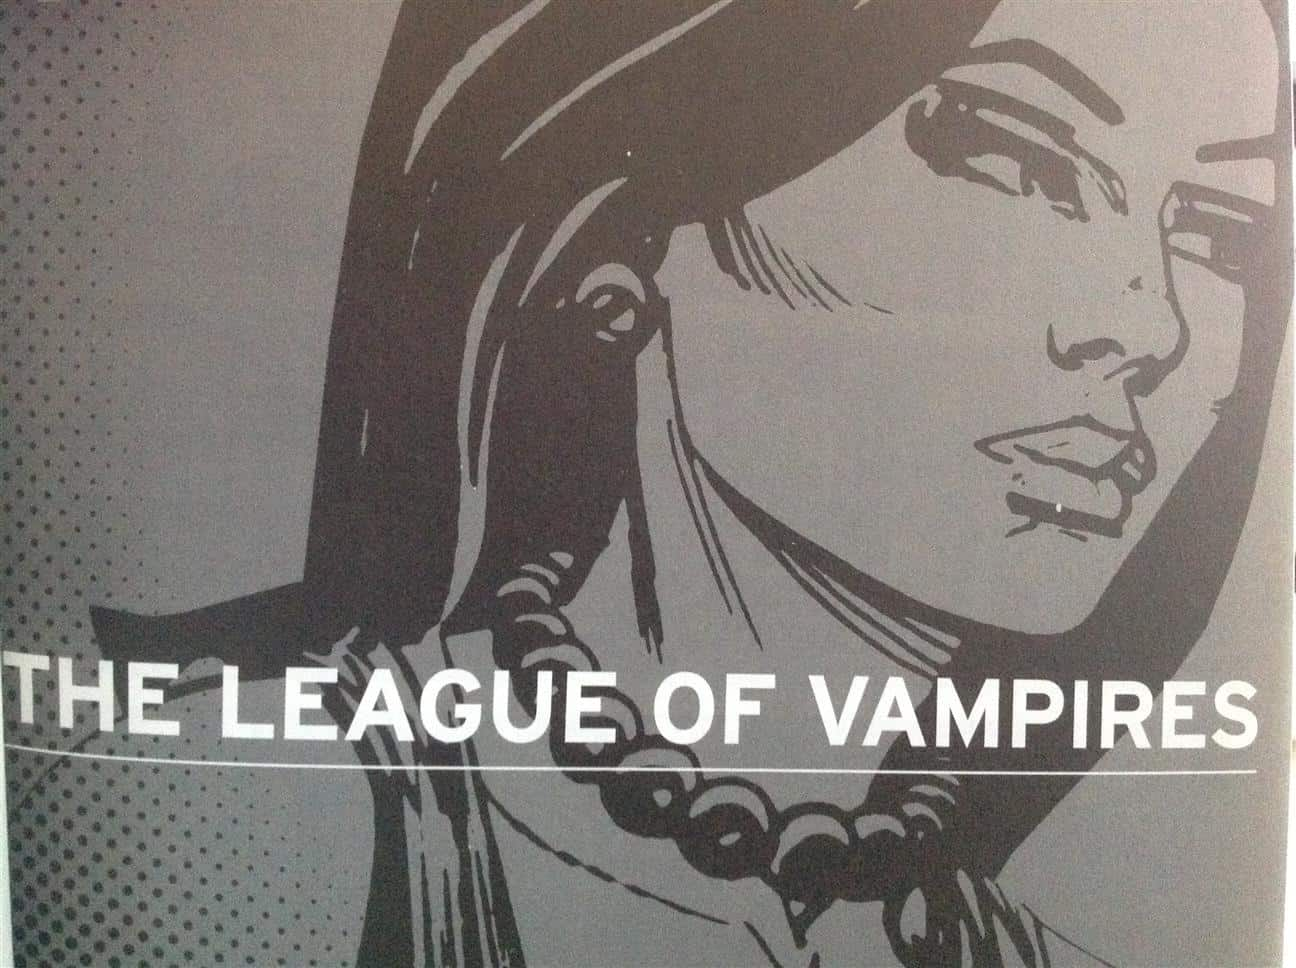 Vampires_title.jpg